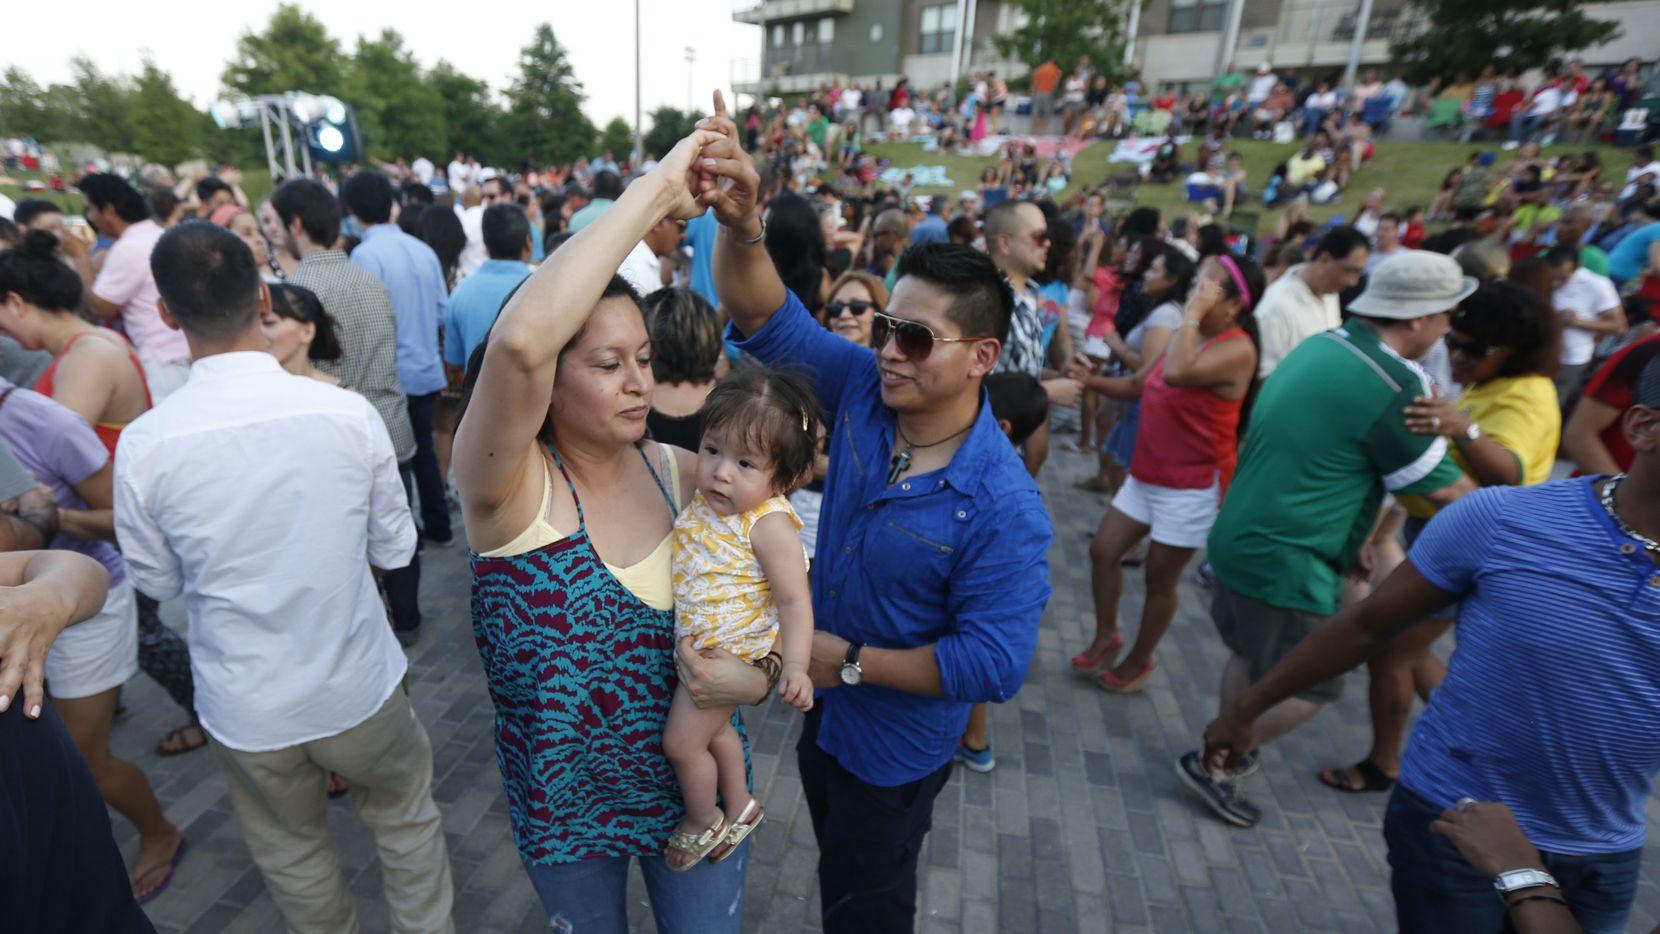 El Vitruvian Salsa Festival se realiza cada agosto en el Vitruvian Park de Addison